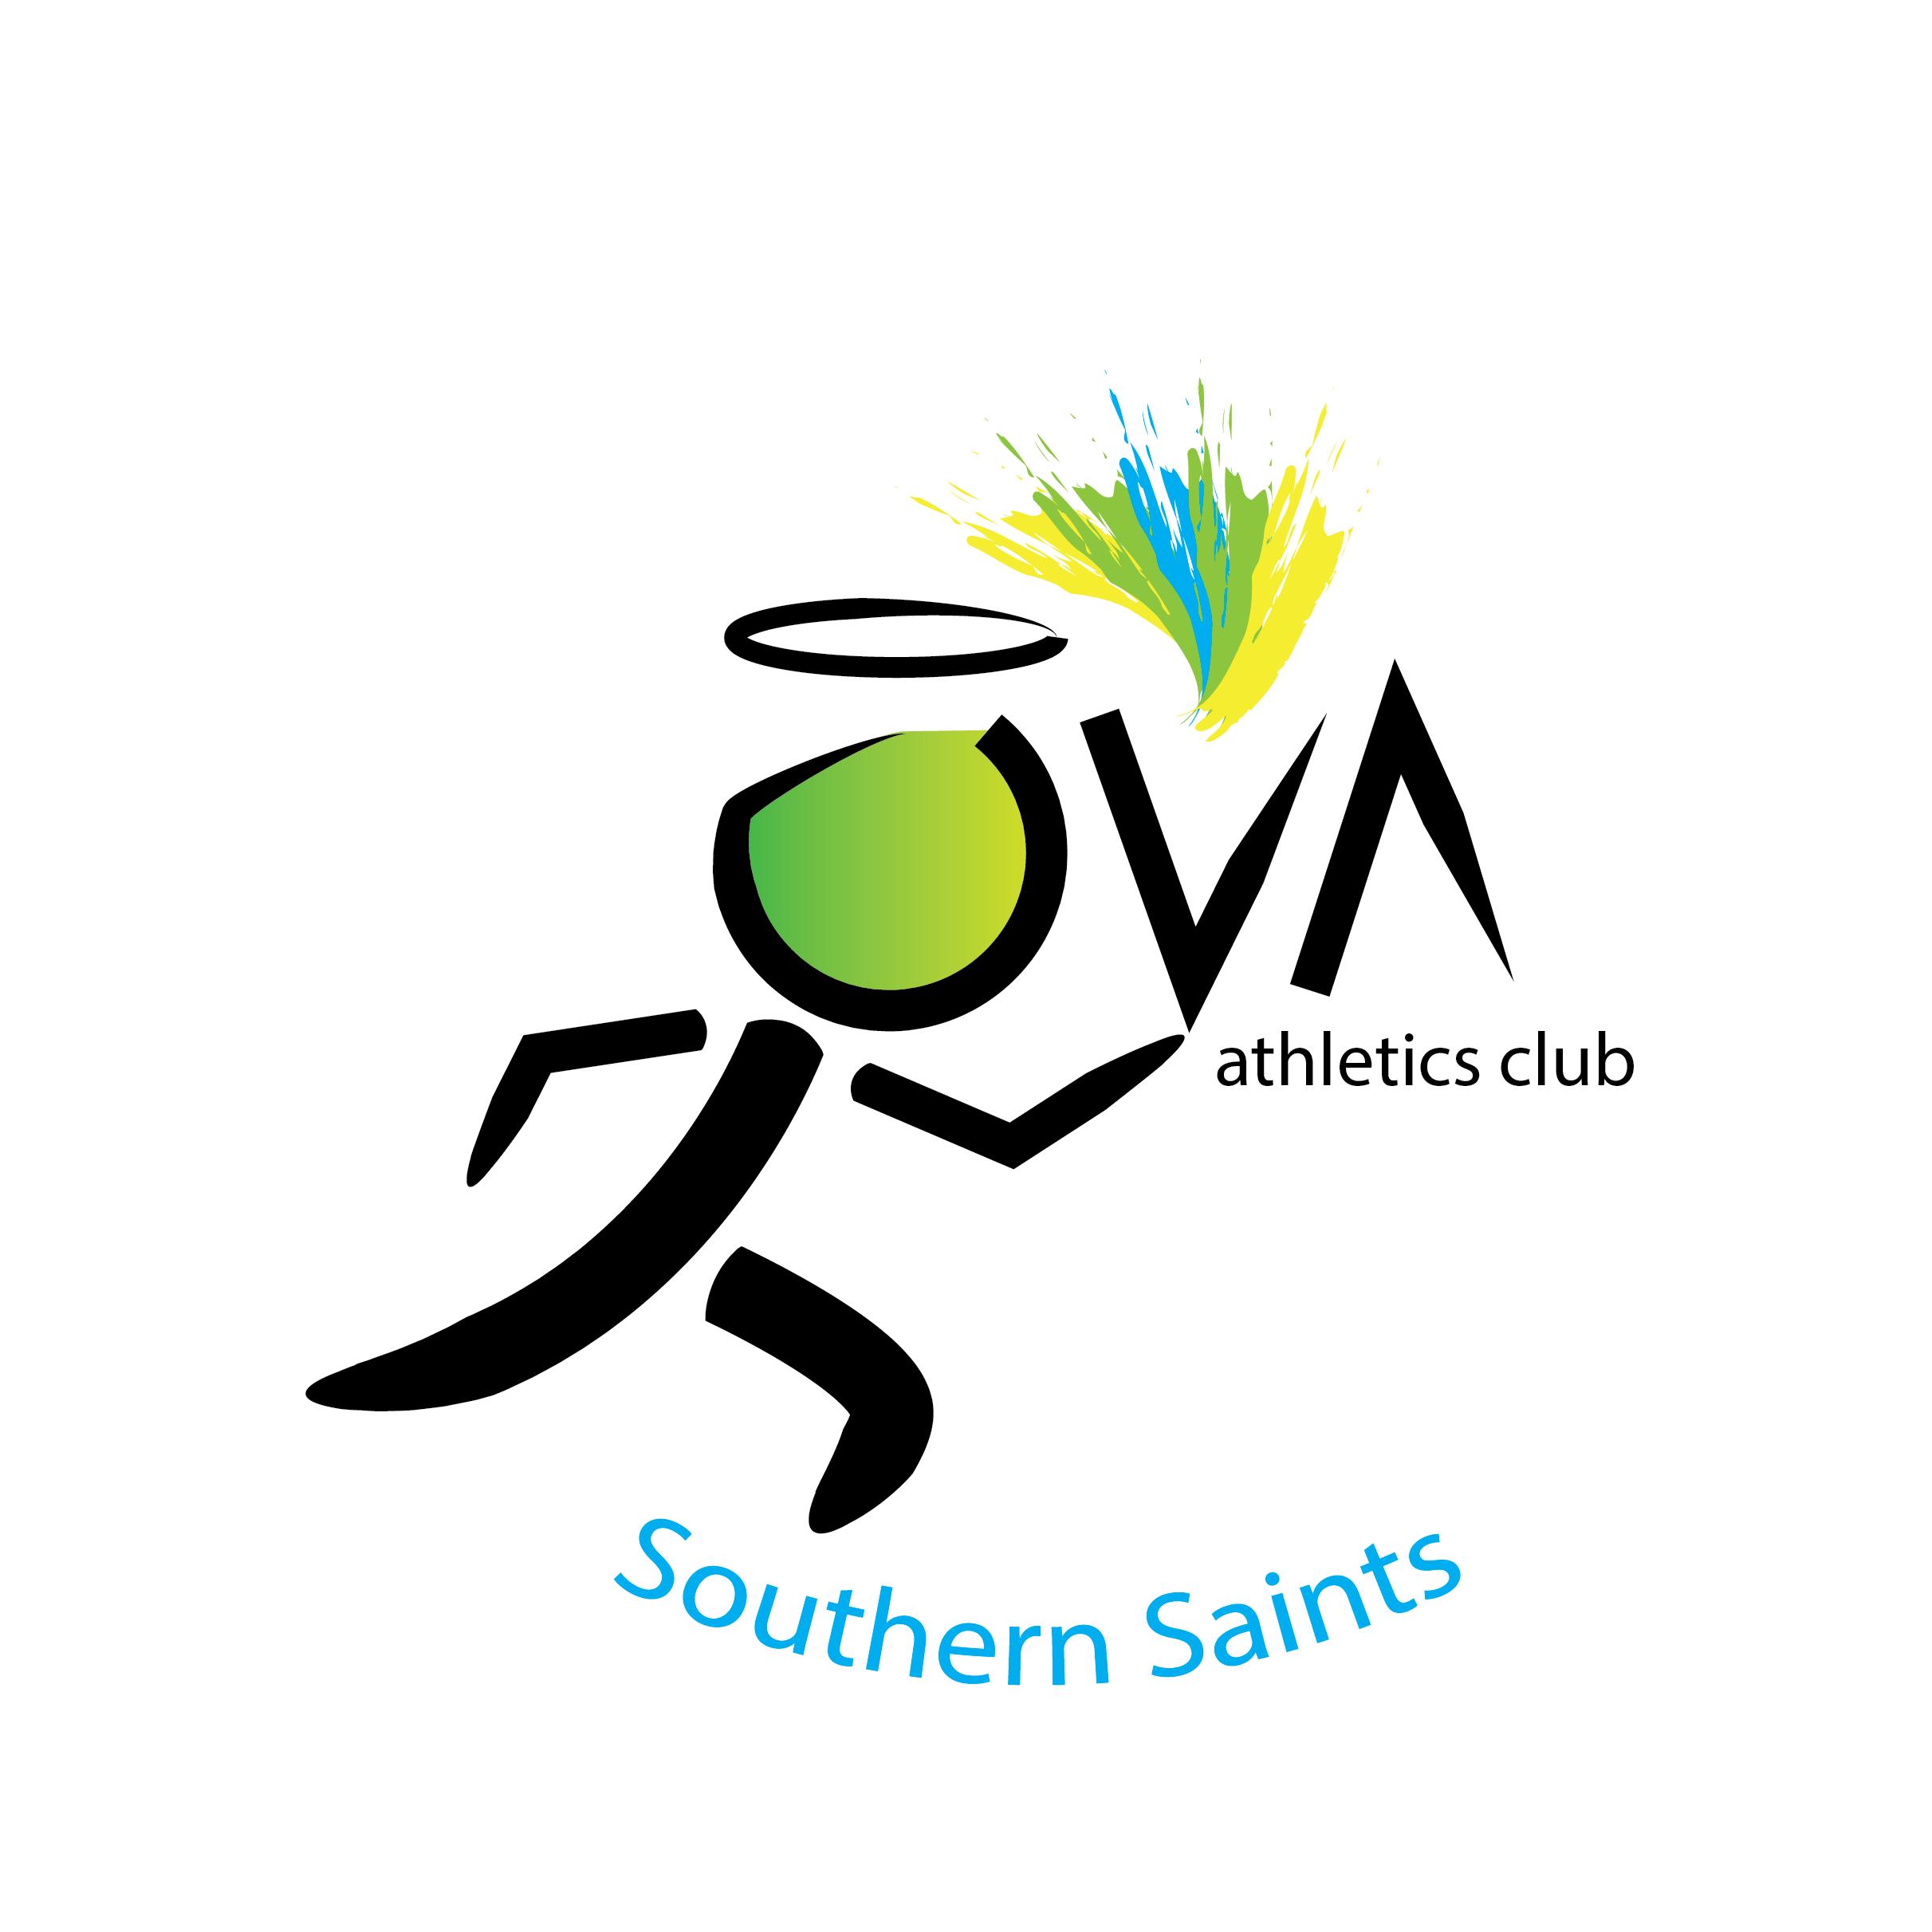 ova southern saints logo image